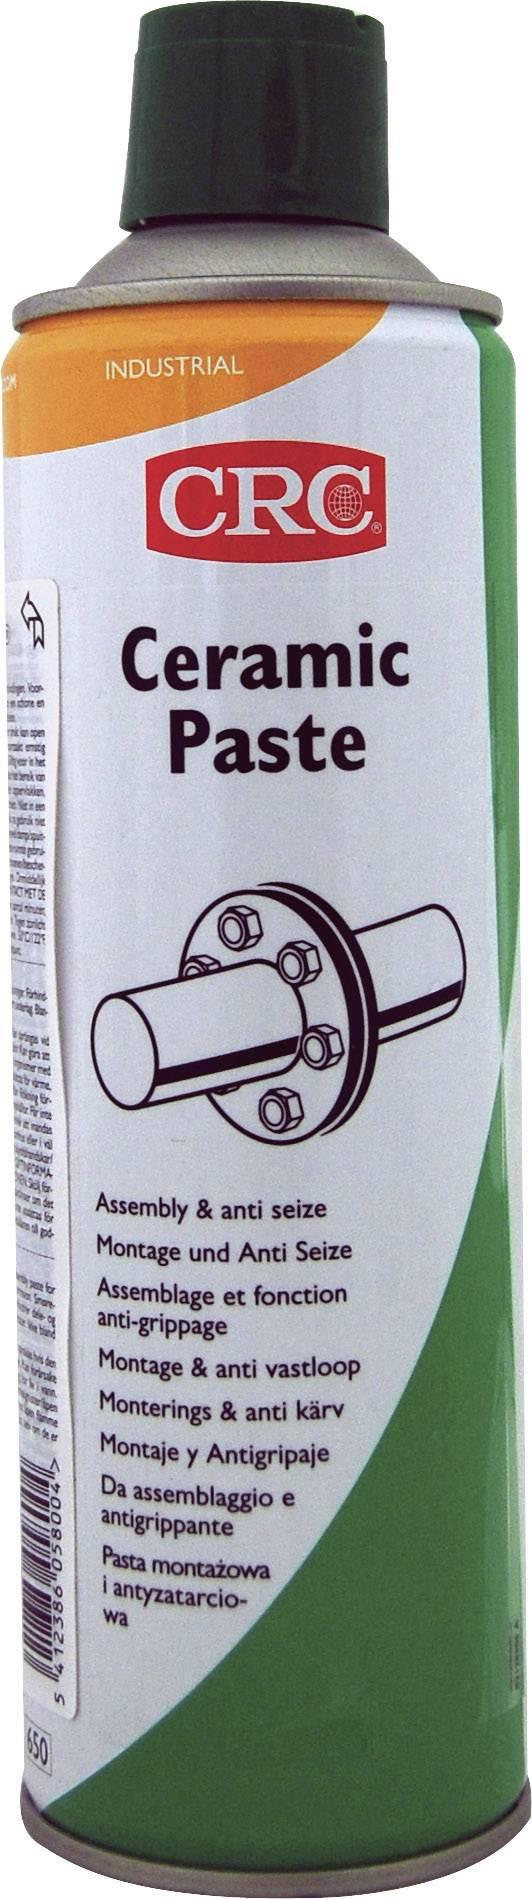 Keramická pasta CERAMIC PASTE CRC, CERAMIC PASTE, 32351-AA 500 ml